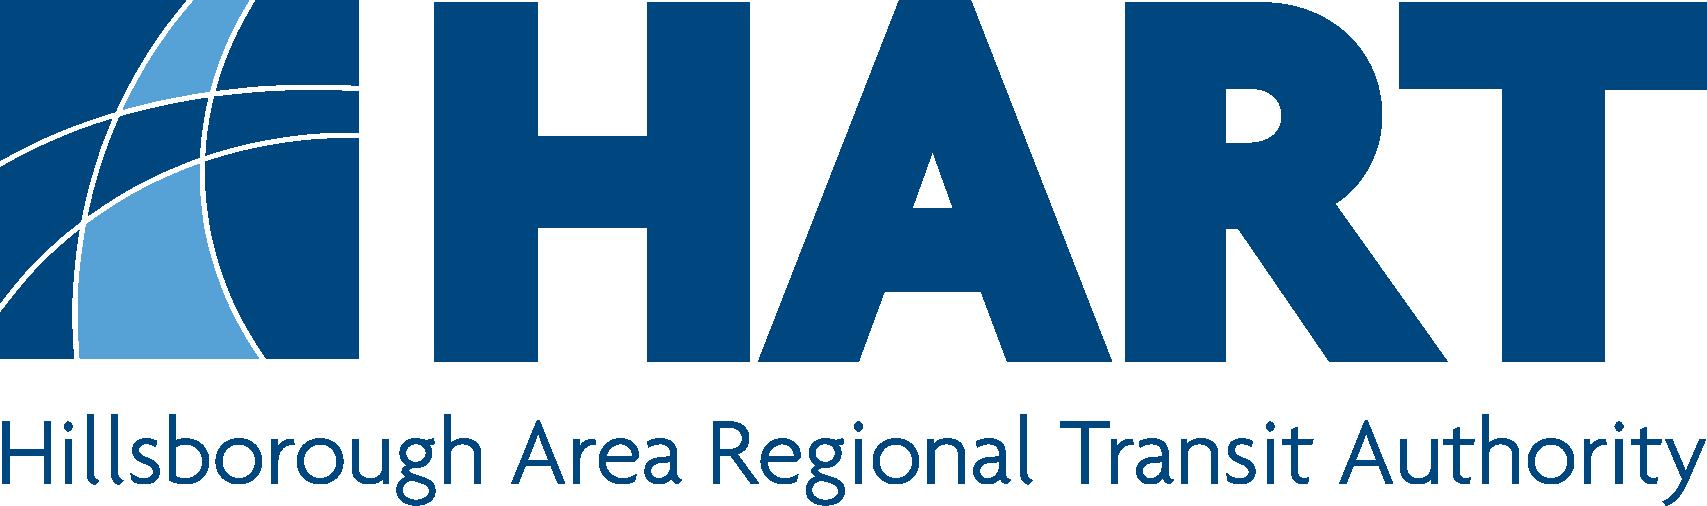 Hillsborough Transit Authority (HART)